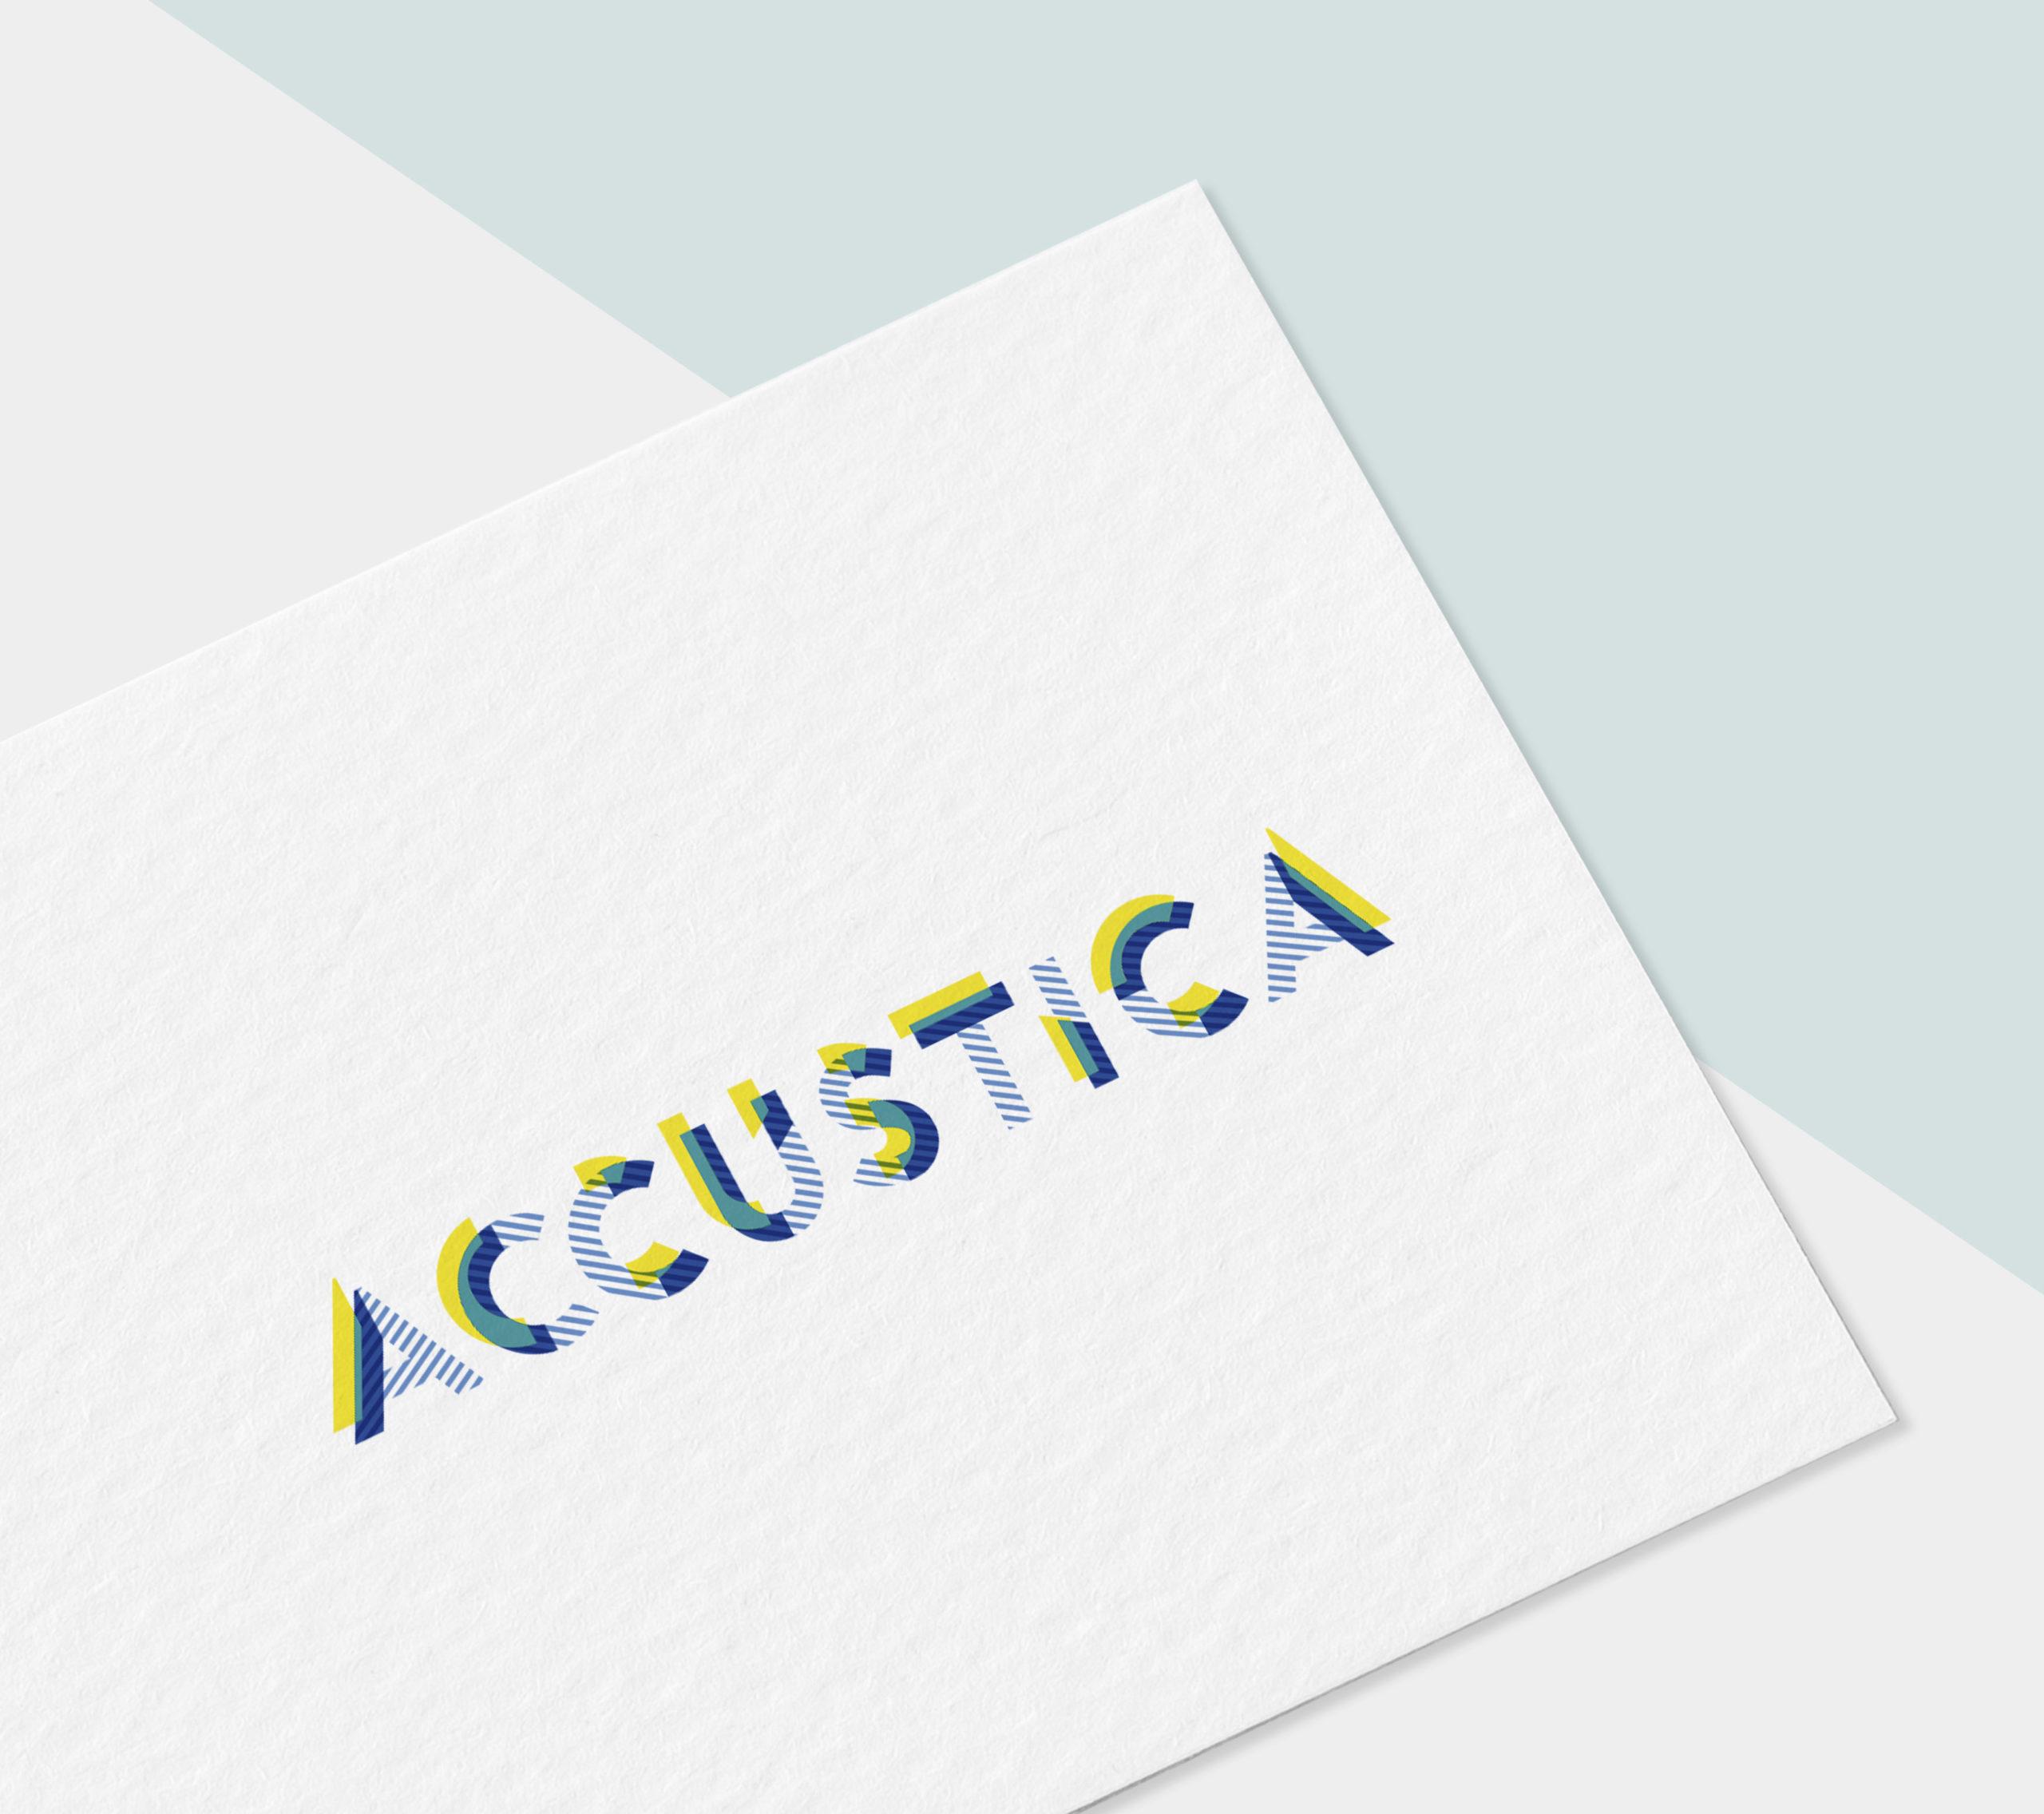 Accustica